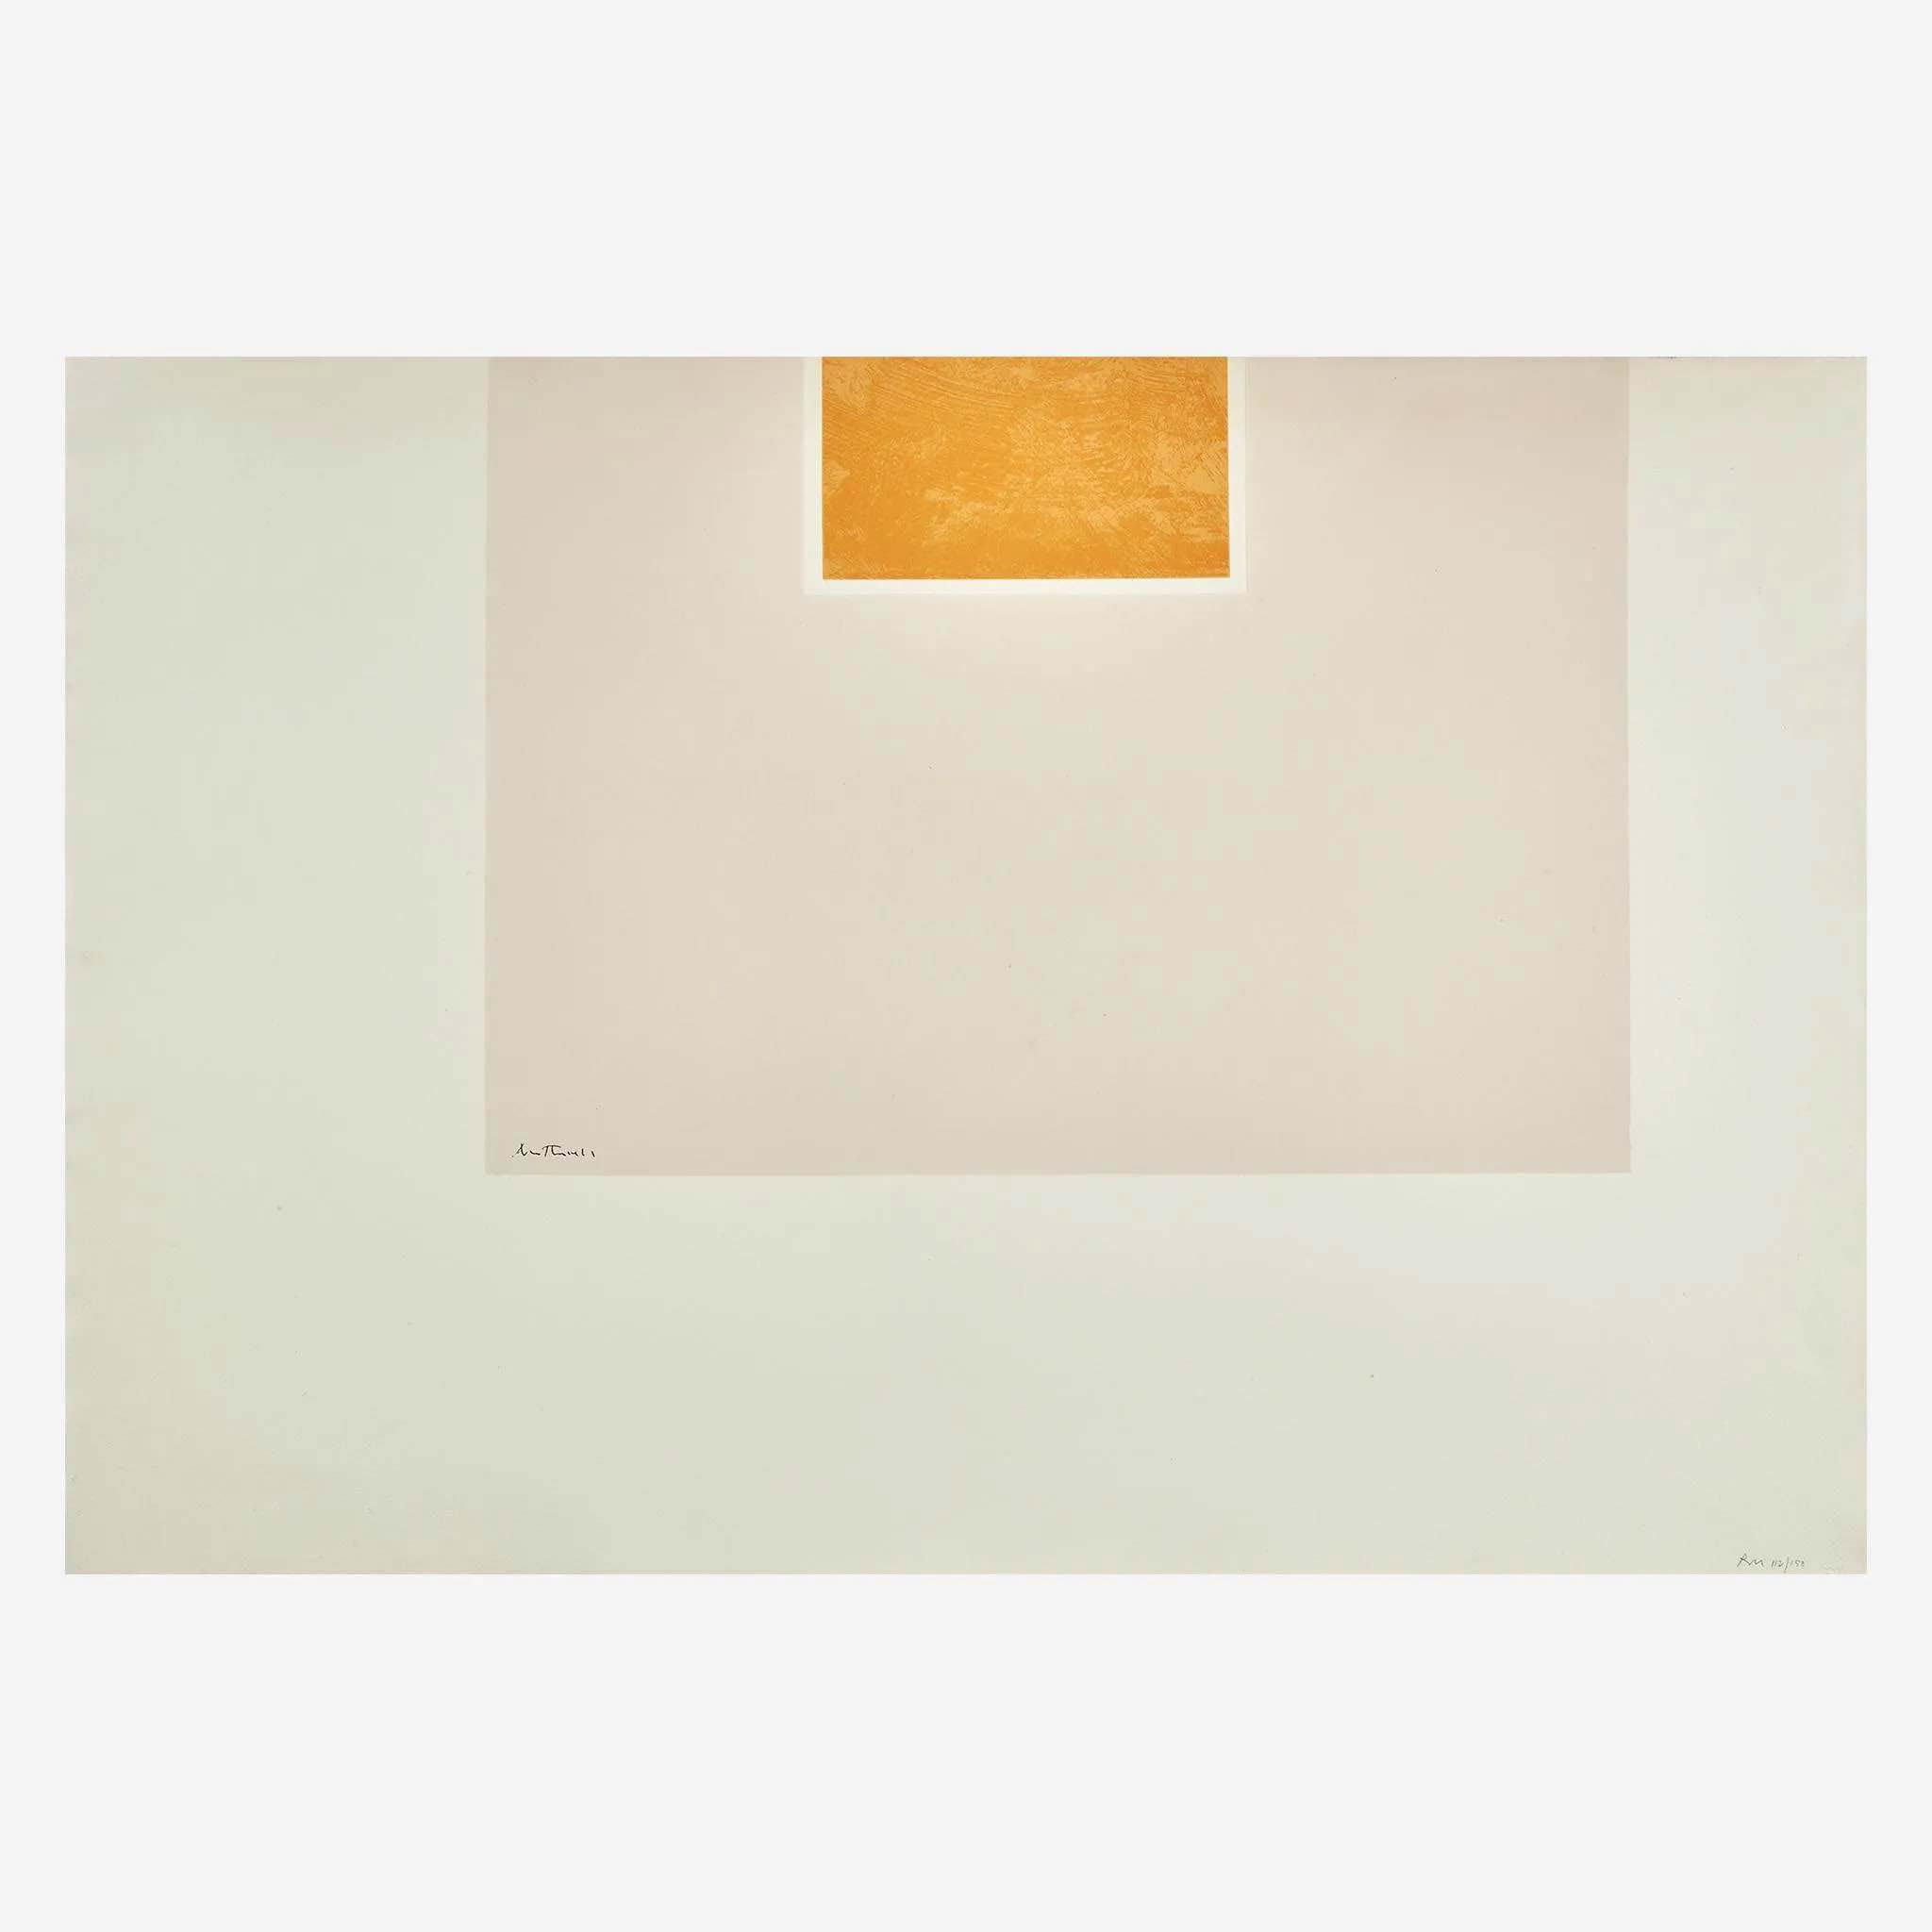 Robert Motherwell (American, 1915-1991), 'London Series II,' five prints, 1970-71, $7,000 plus buyer's premium. Image courtesy Freeman's